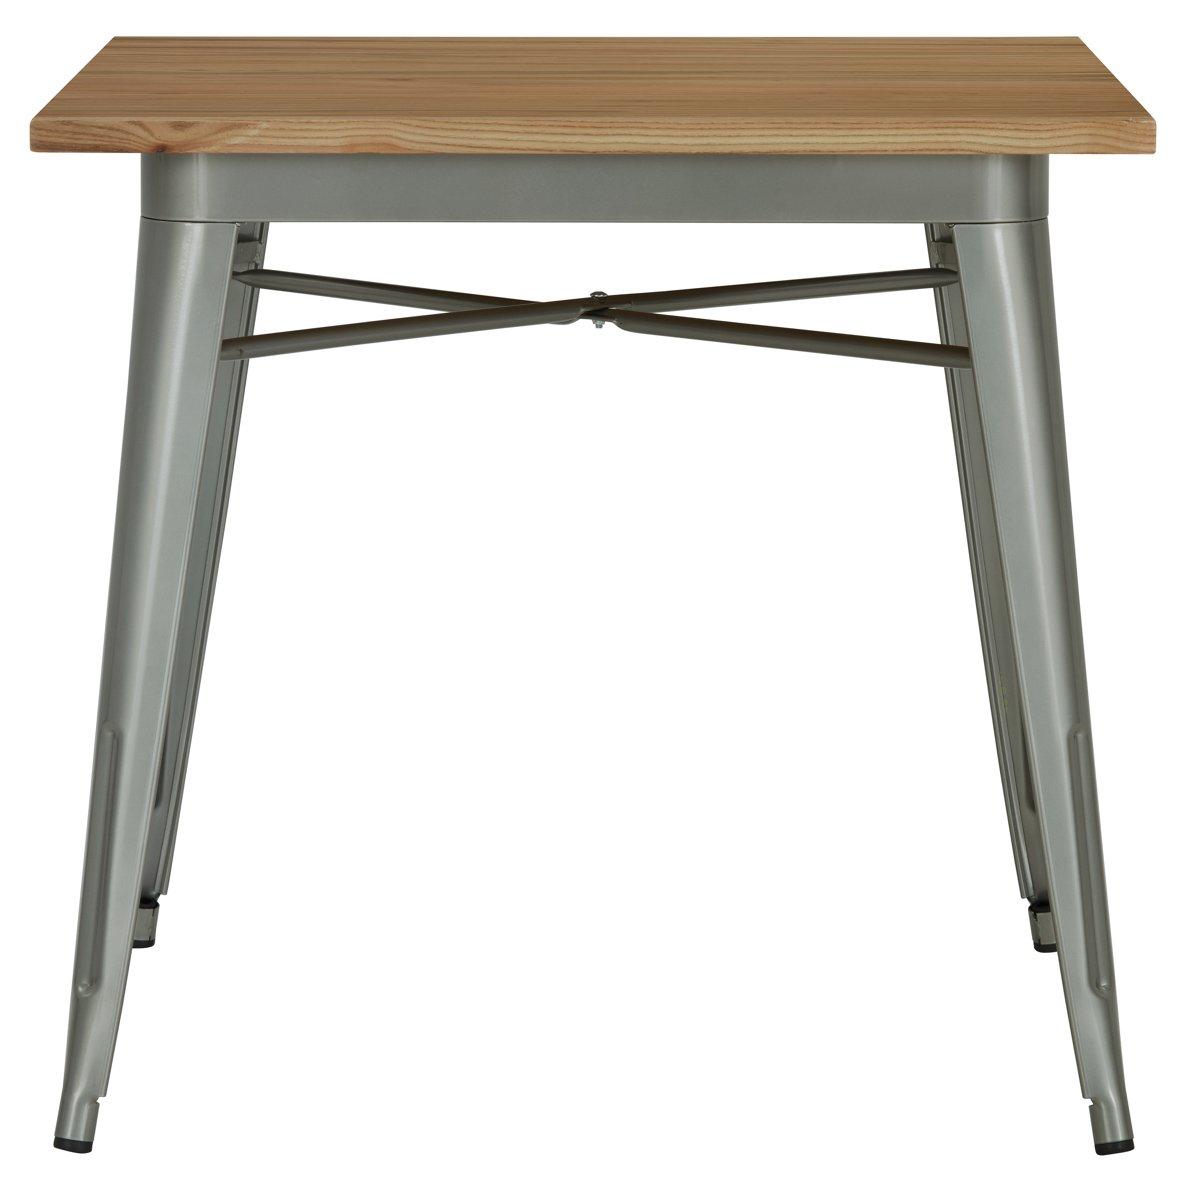 Huntley Light Tone Wood Square Table